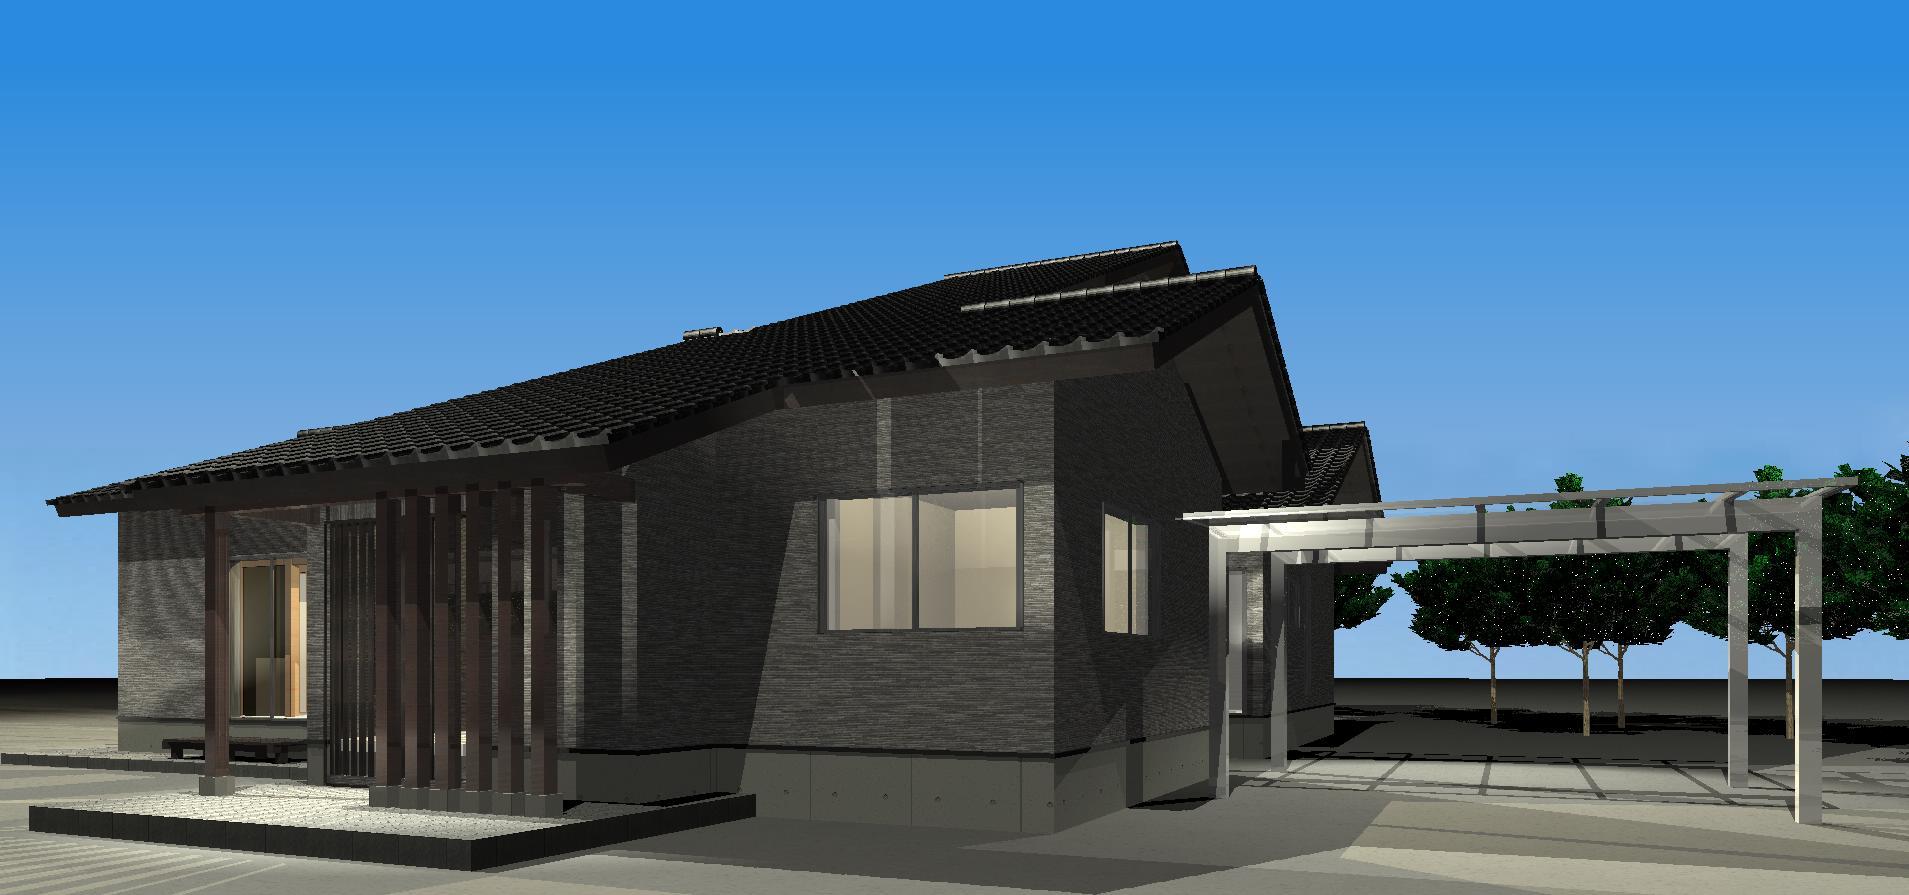 3Dパース   Tu house004